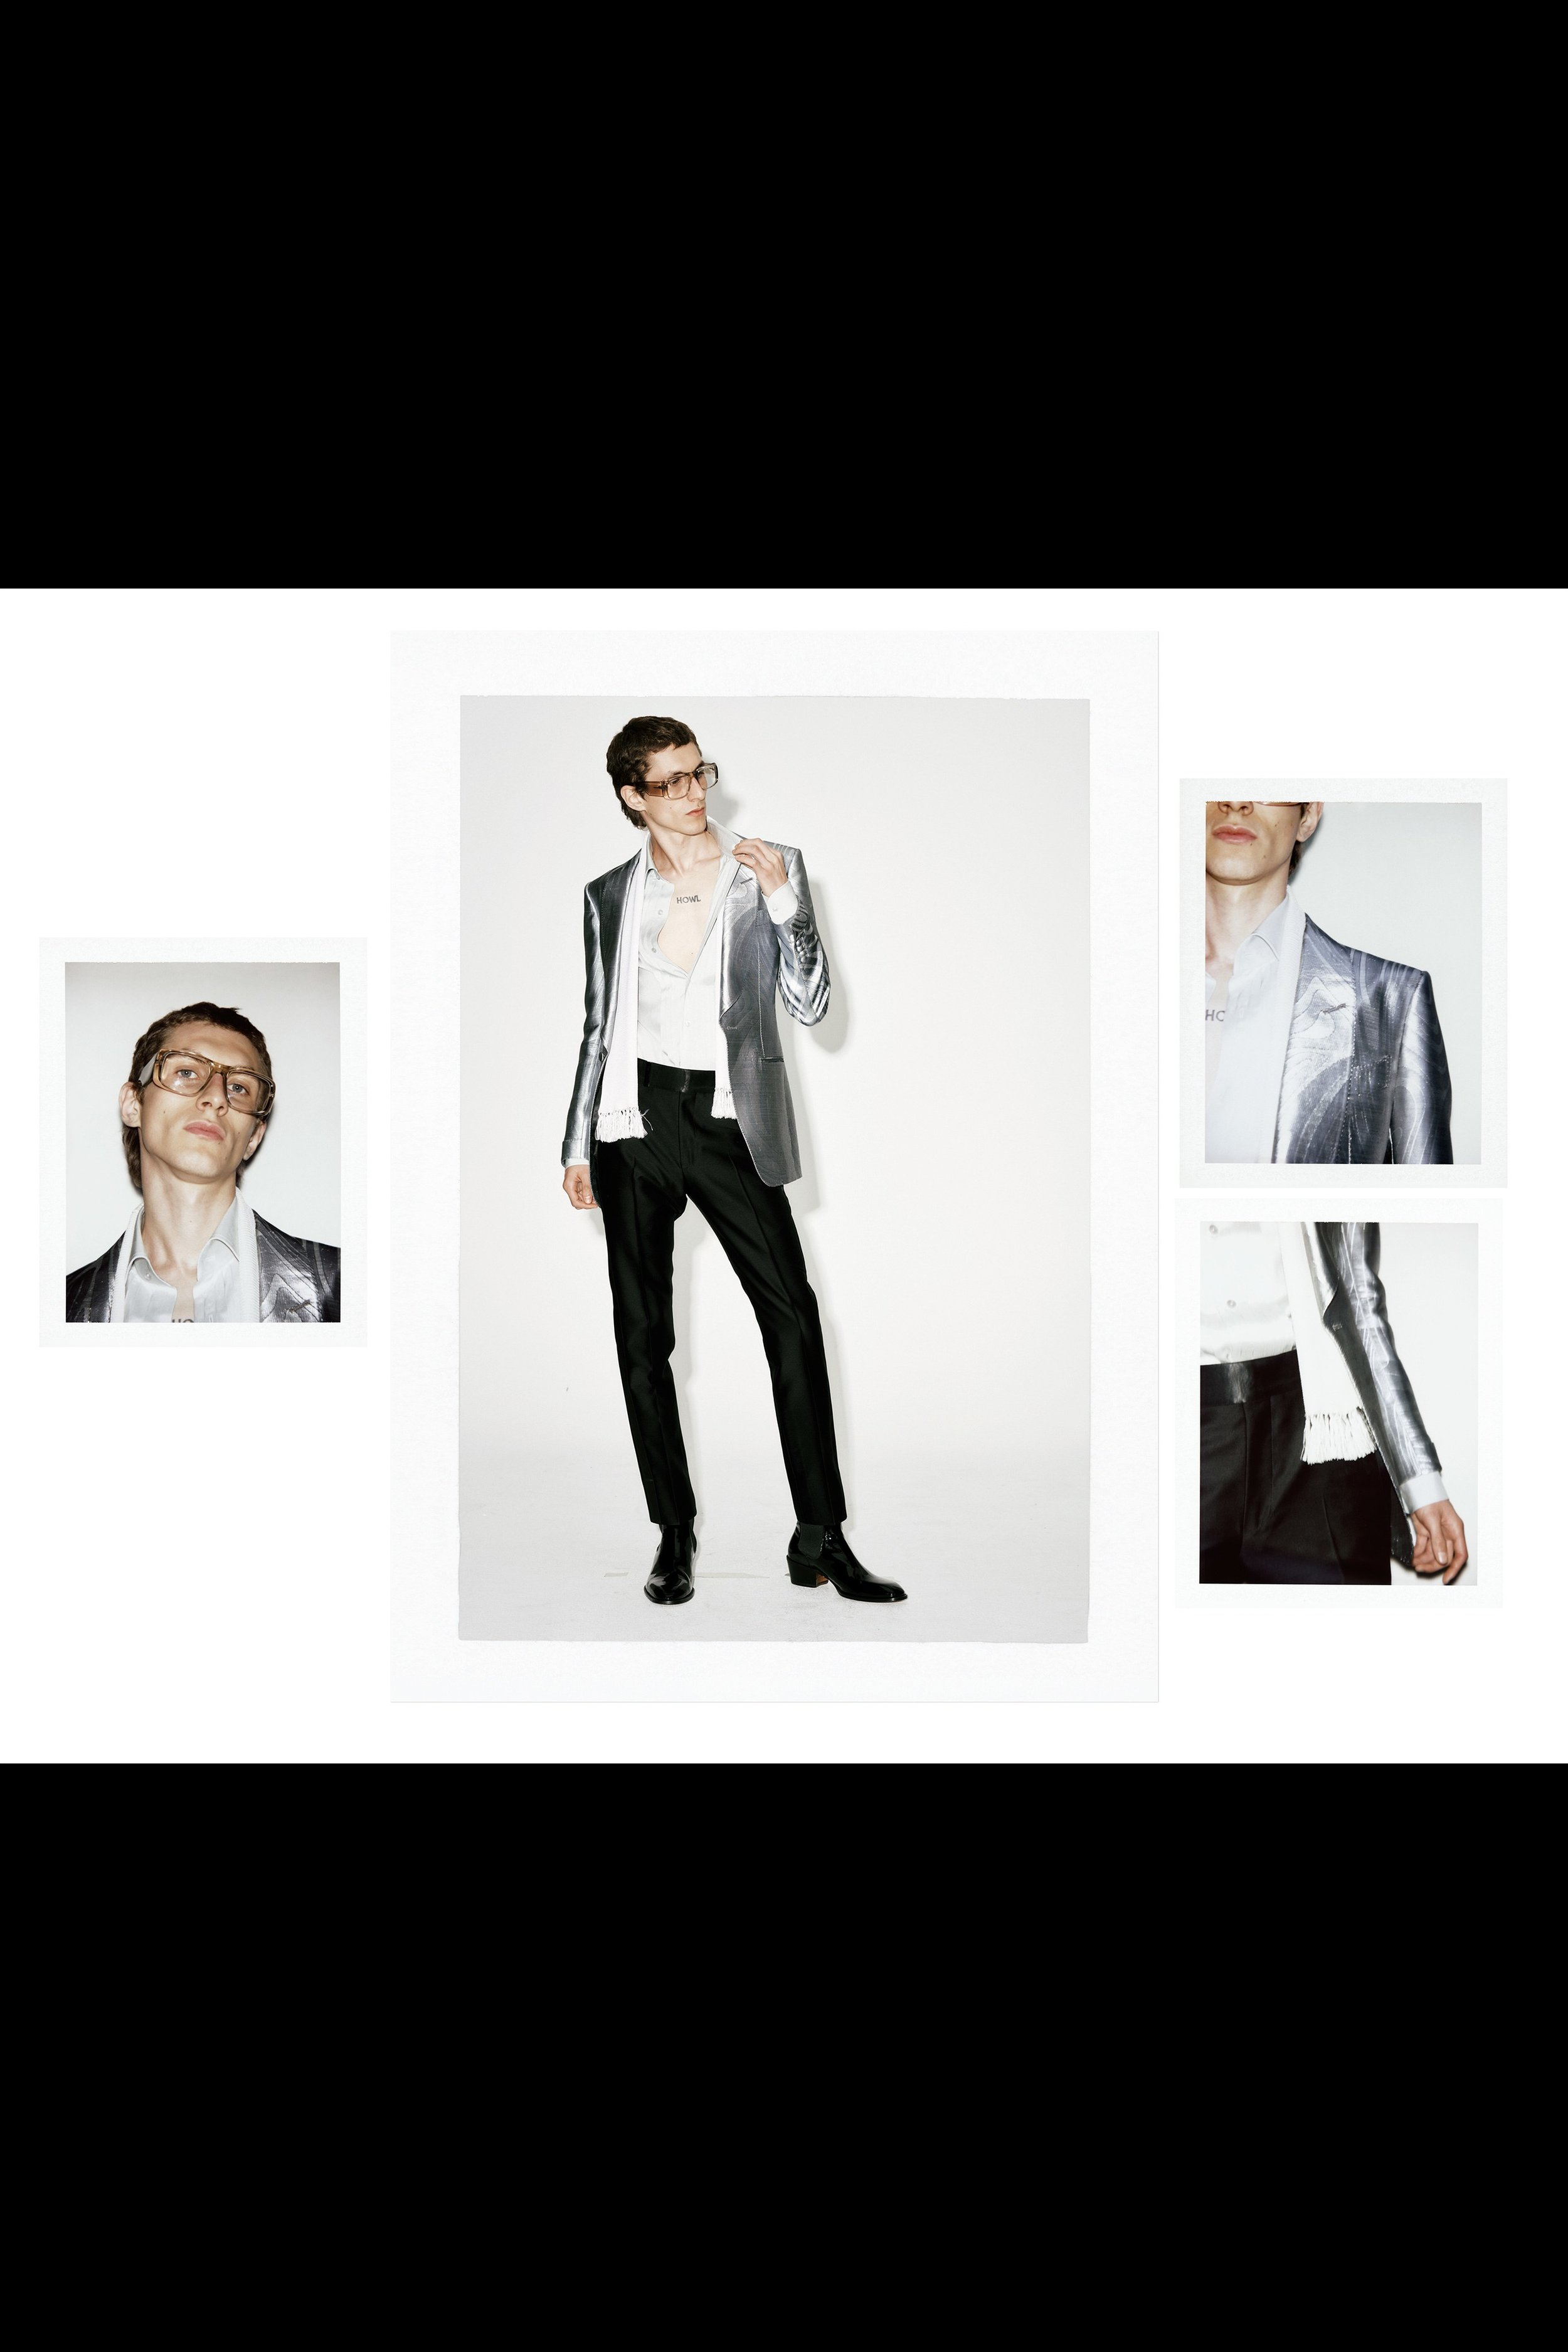 00036-Tom-Ford-vogue-menswear-spring-2019-pr.jpg